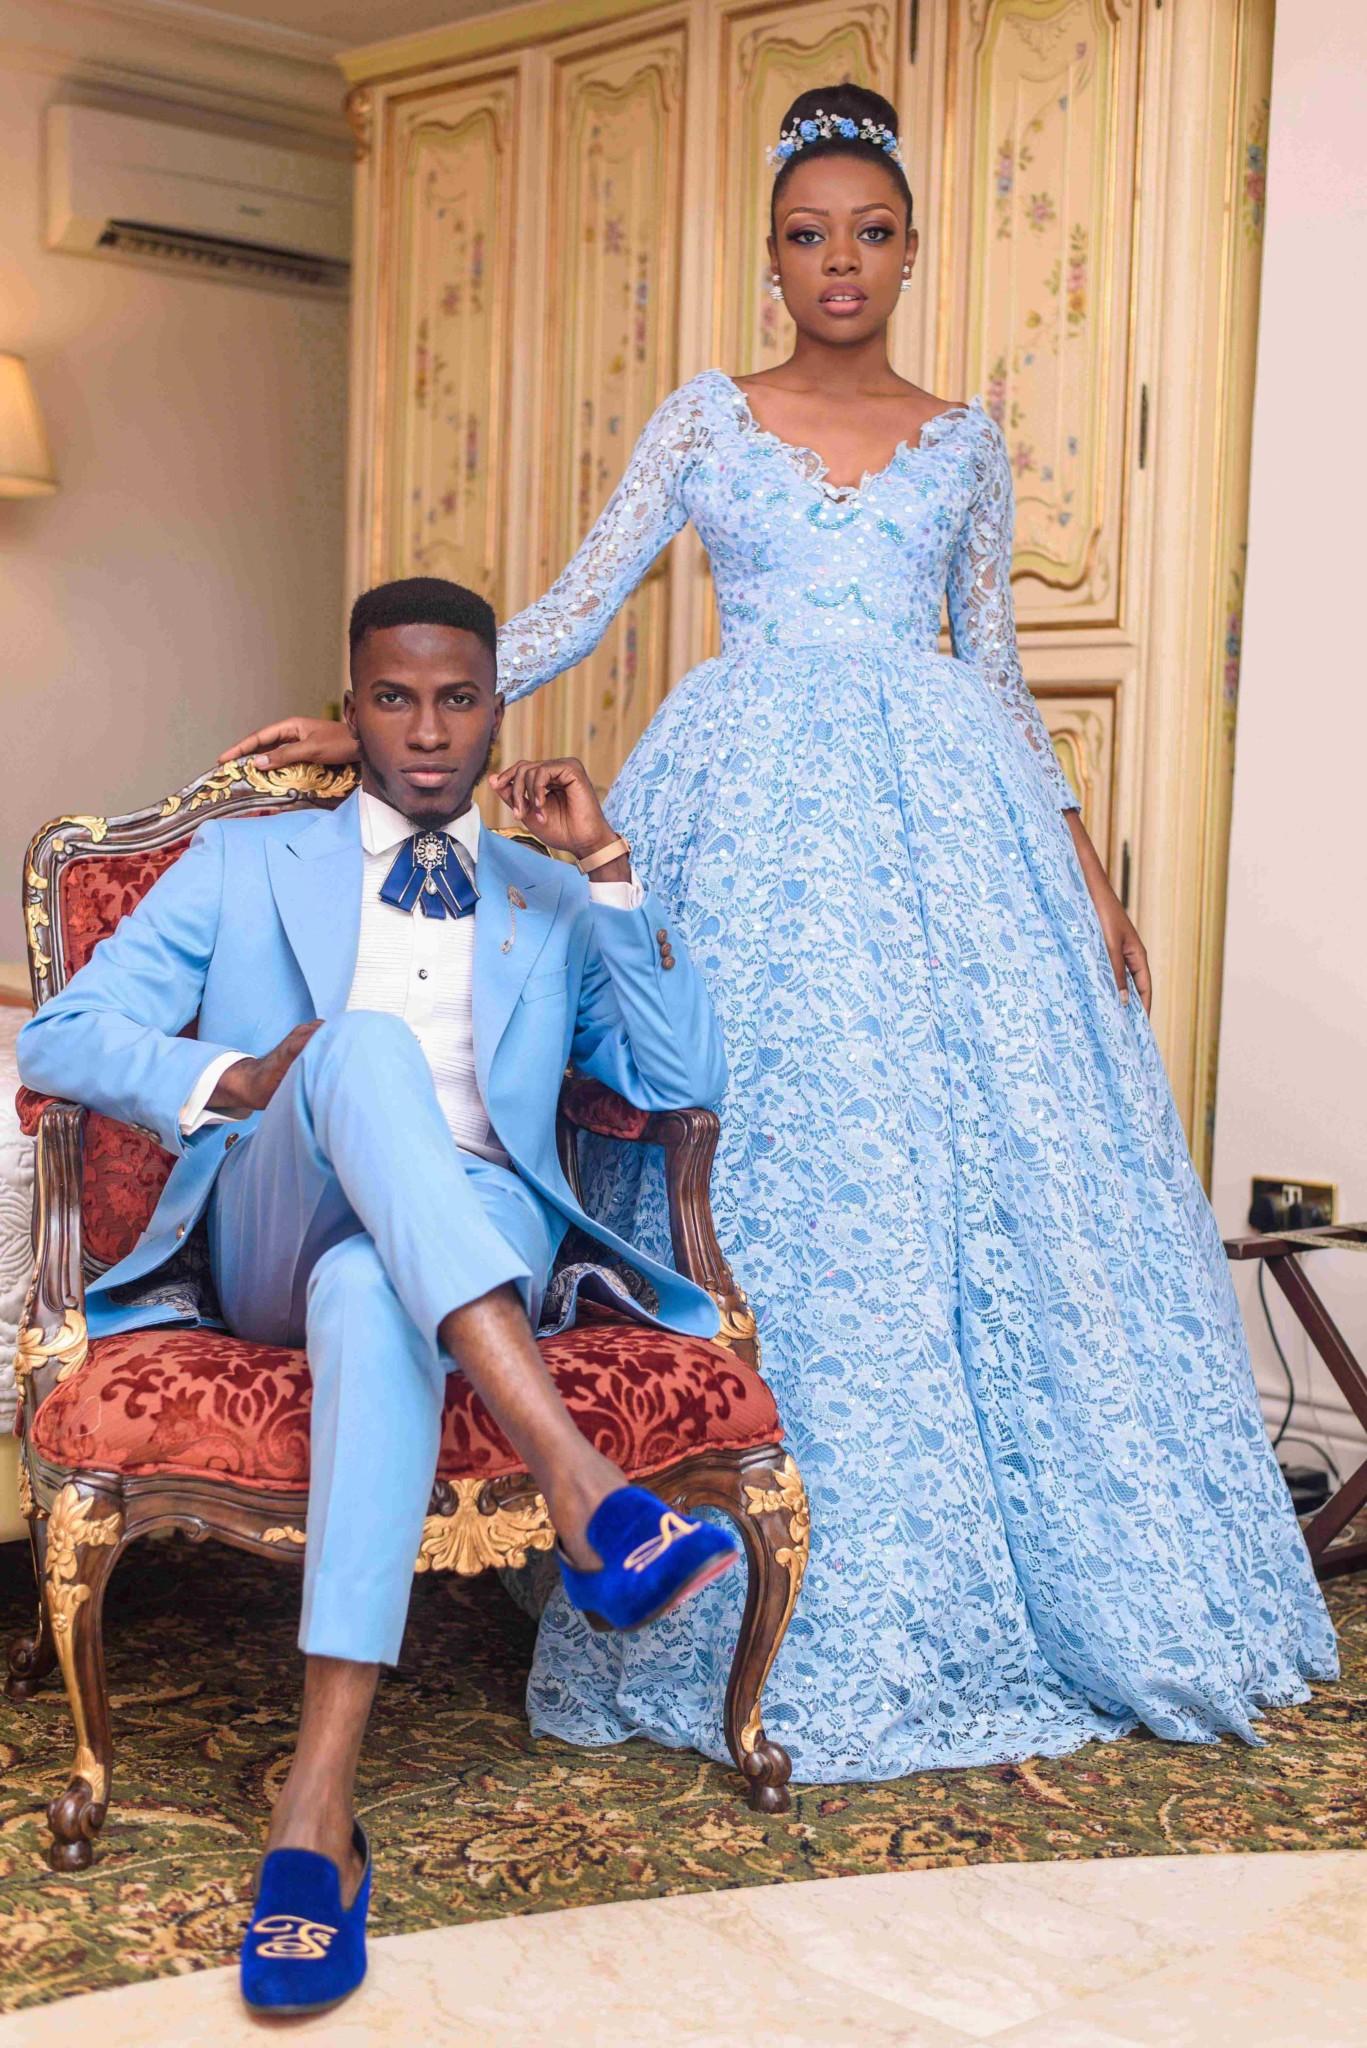 Akin Faminu Tosin Sho-Silva take on Wedding Fashion with a